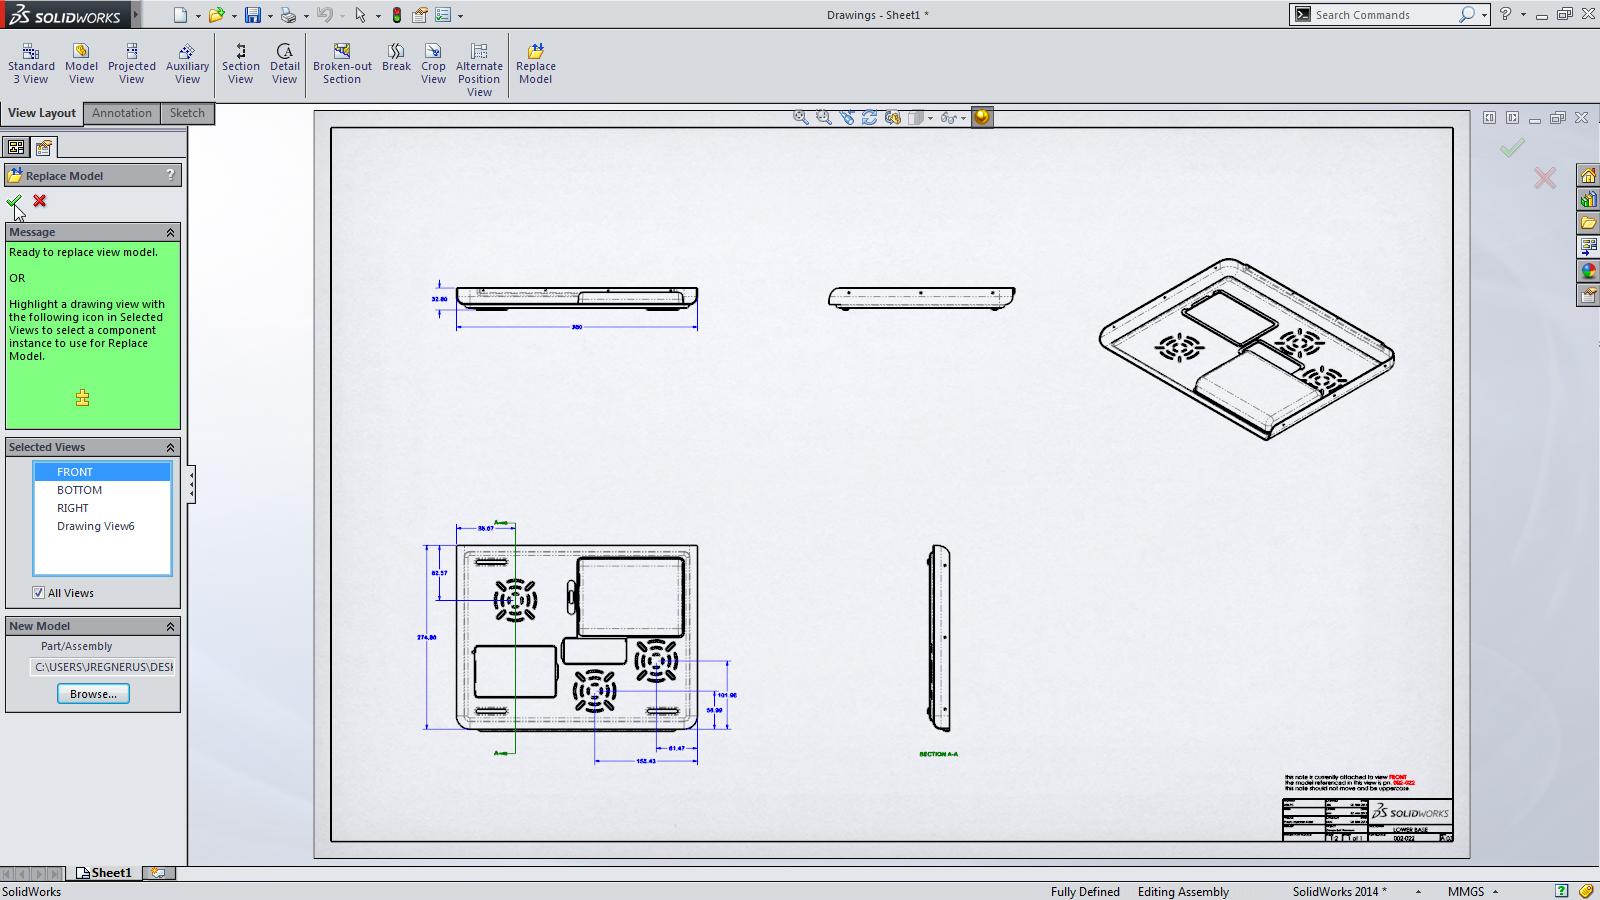 SolidWorks 2014 Sneak Peek: Replace Model View